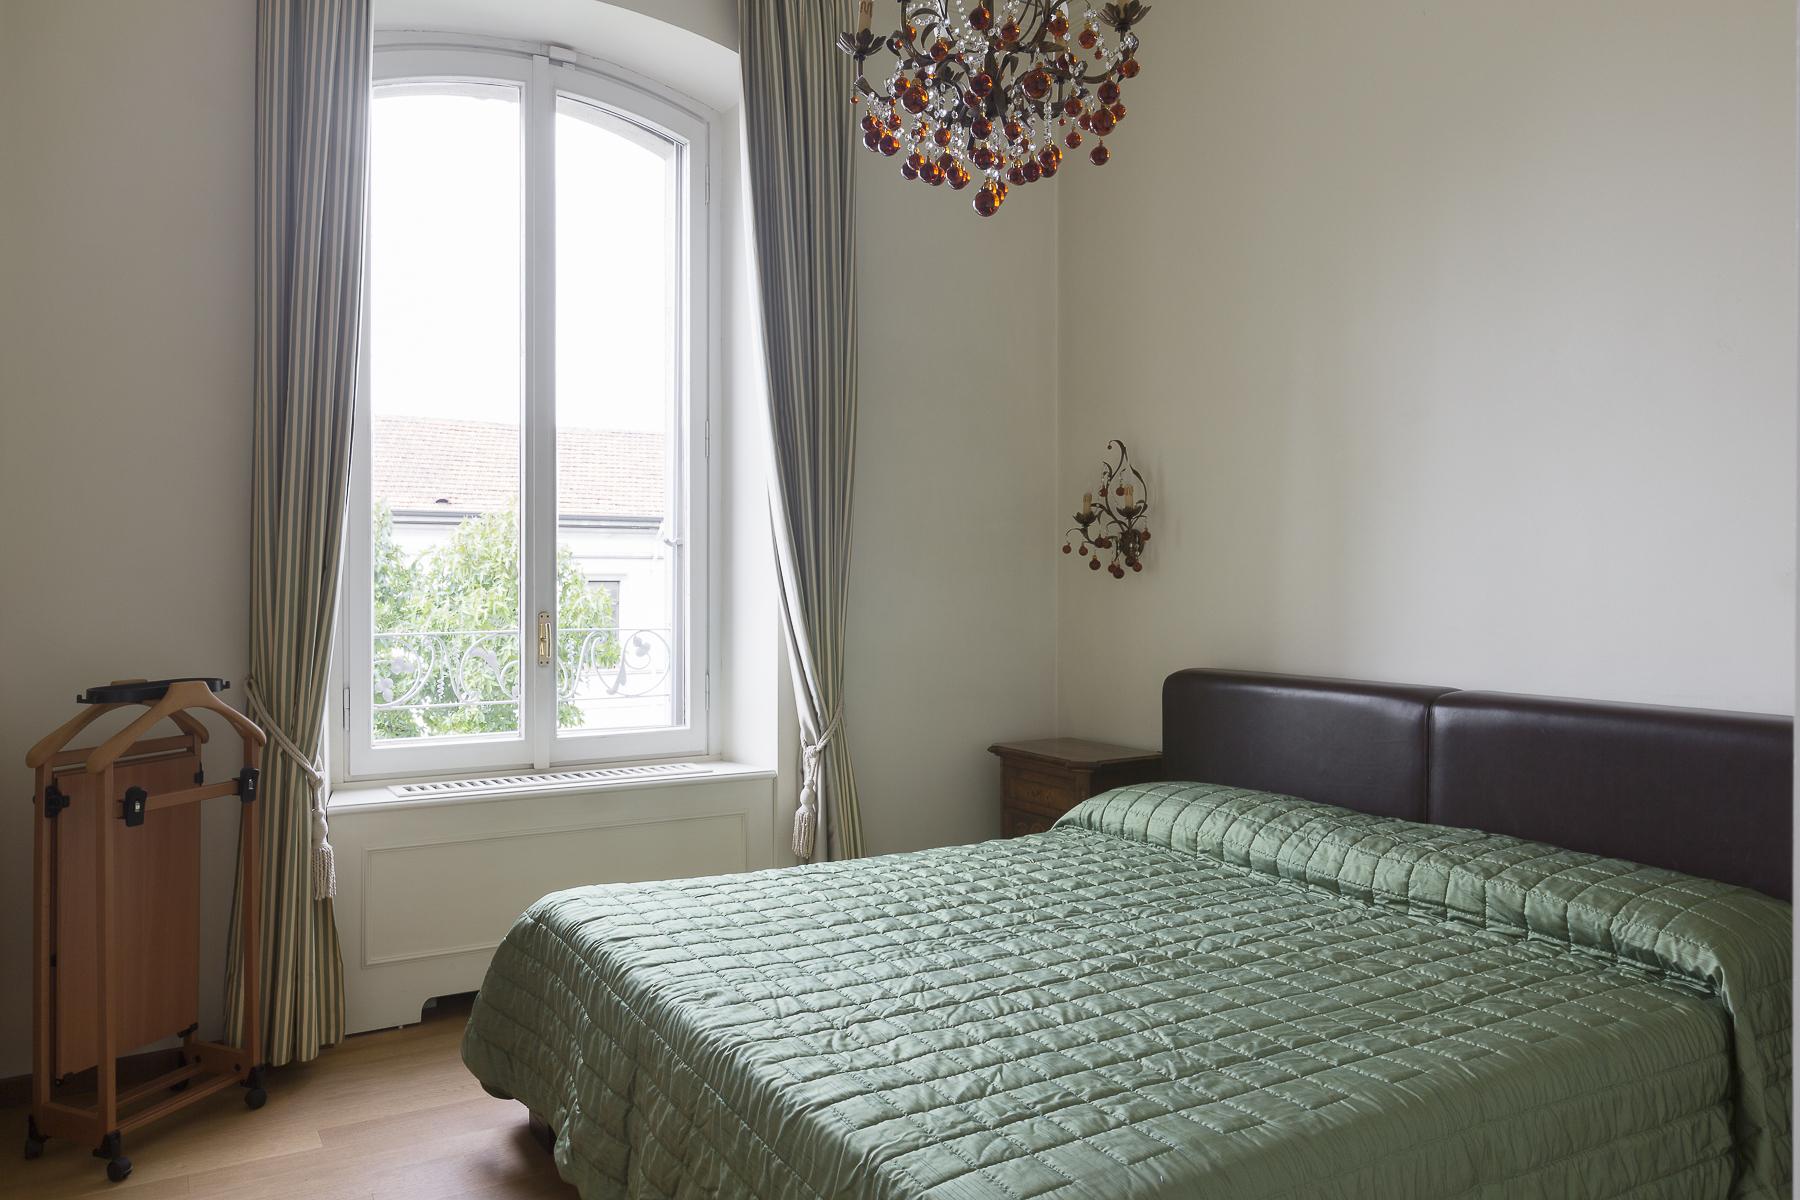 Additional photo for property listing at Prestigious apartament in elegant historical building Corso Sempione Milano, Milan 20145 Italien